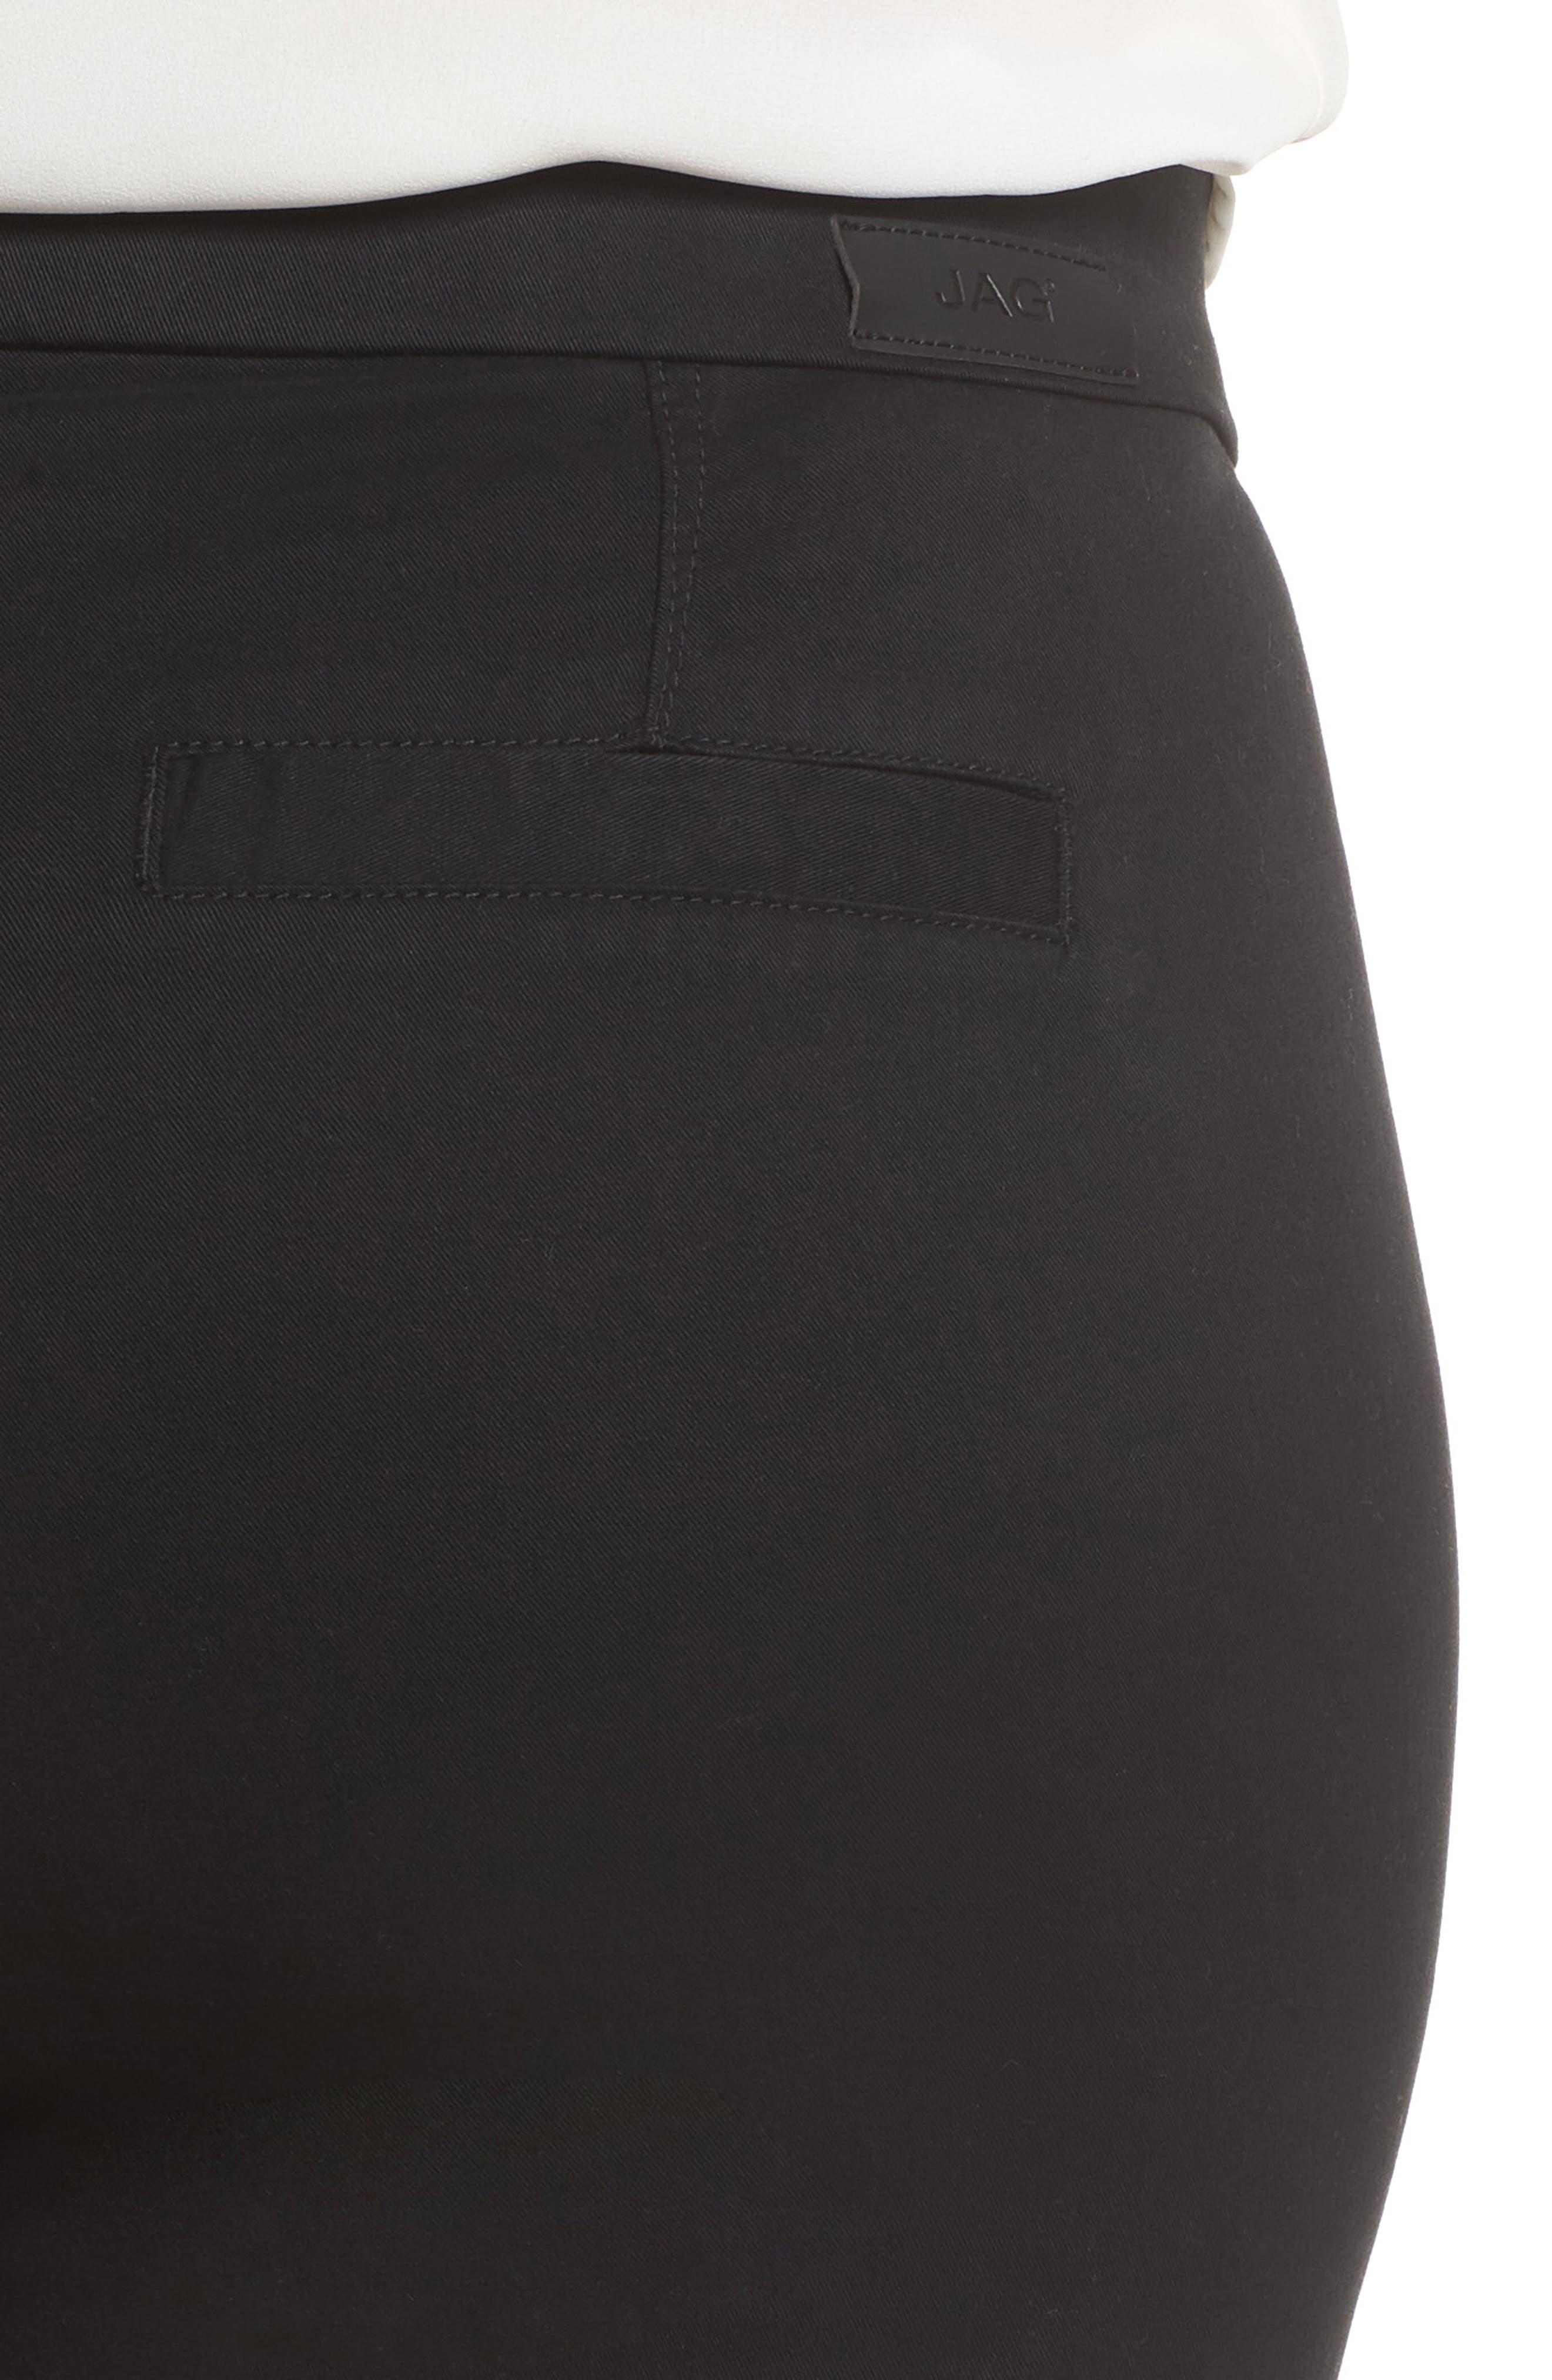 Gracie Stretch Cotton Shorts,                             Alternate thumbnail 4, color,                             BLACK